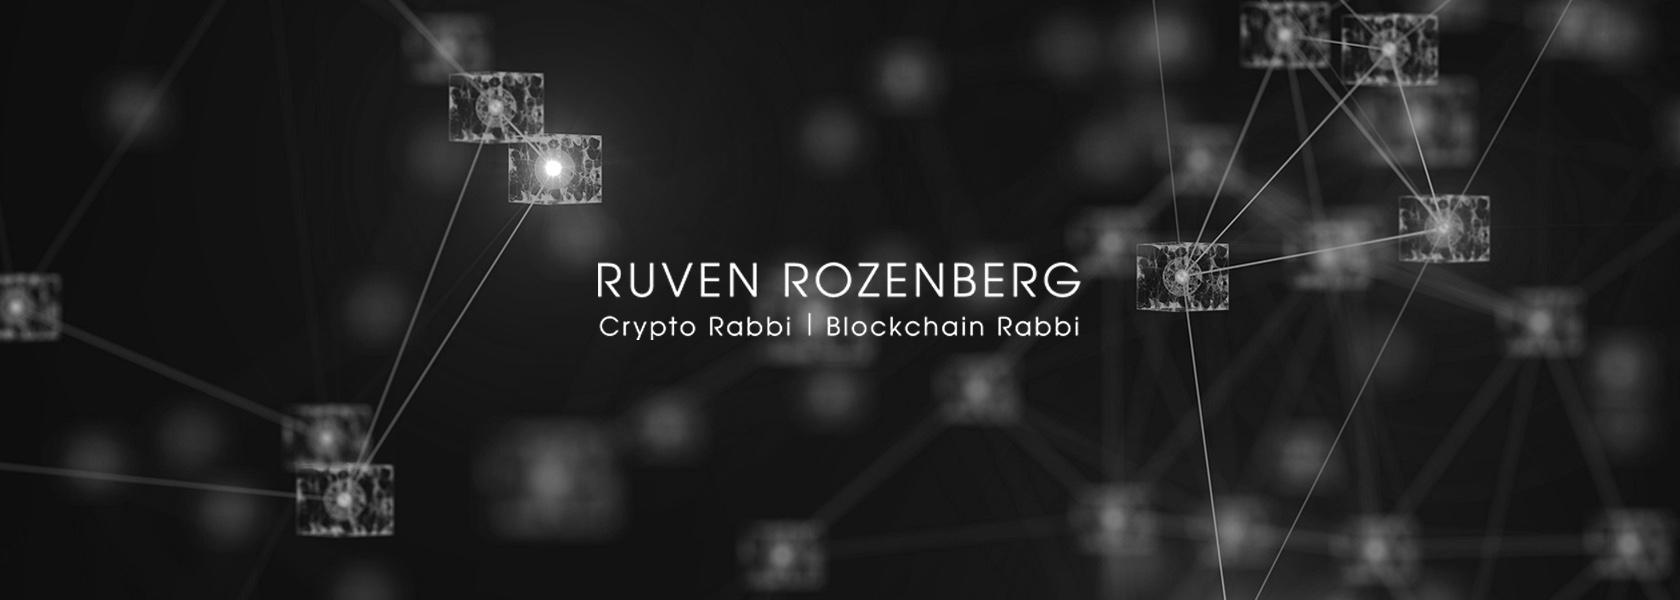 Ruven Rozenberg дизайн логотипа